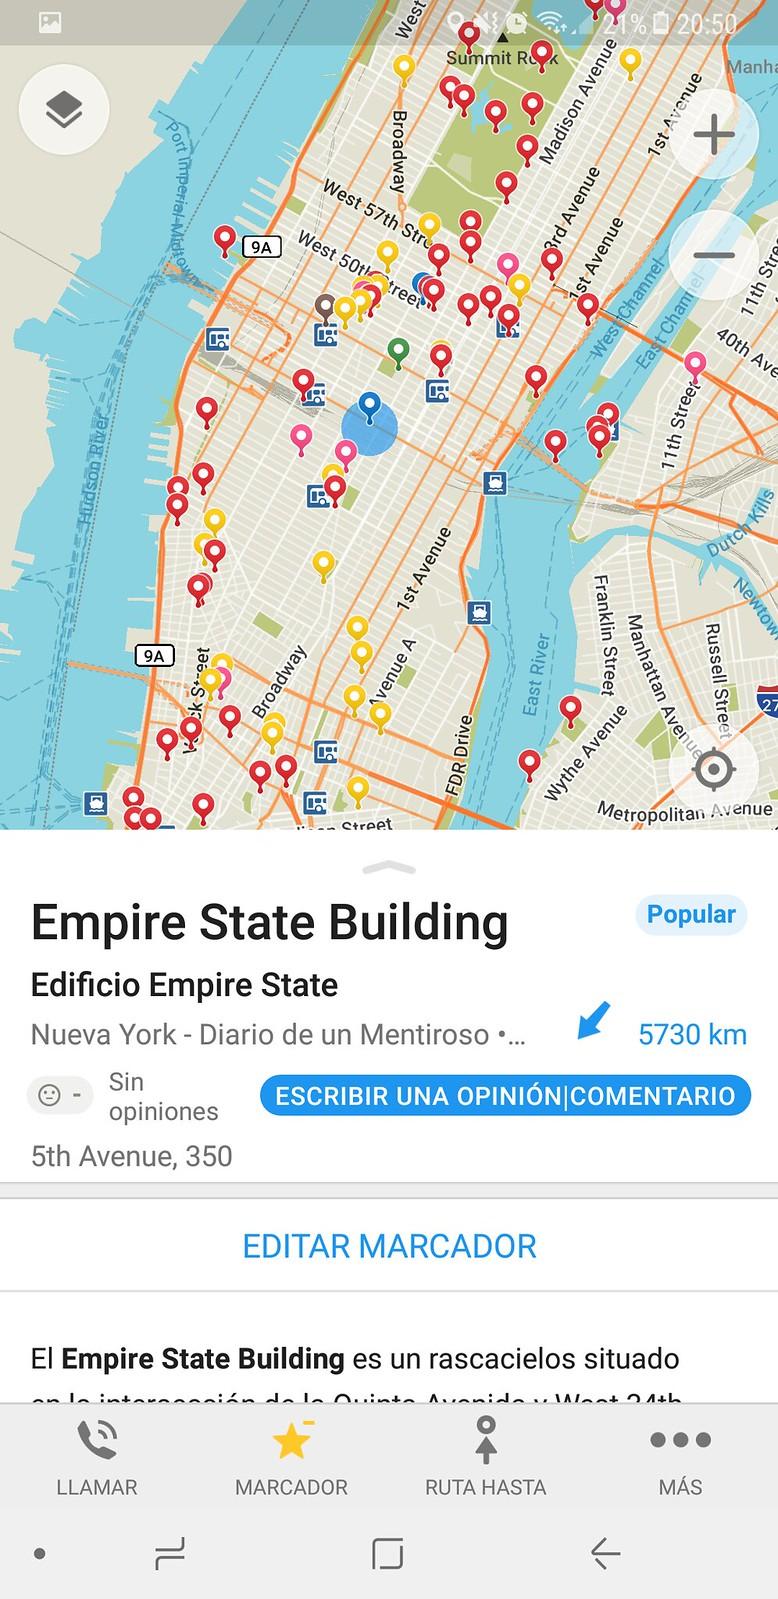 Mapa gratis de Nueva York en Español